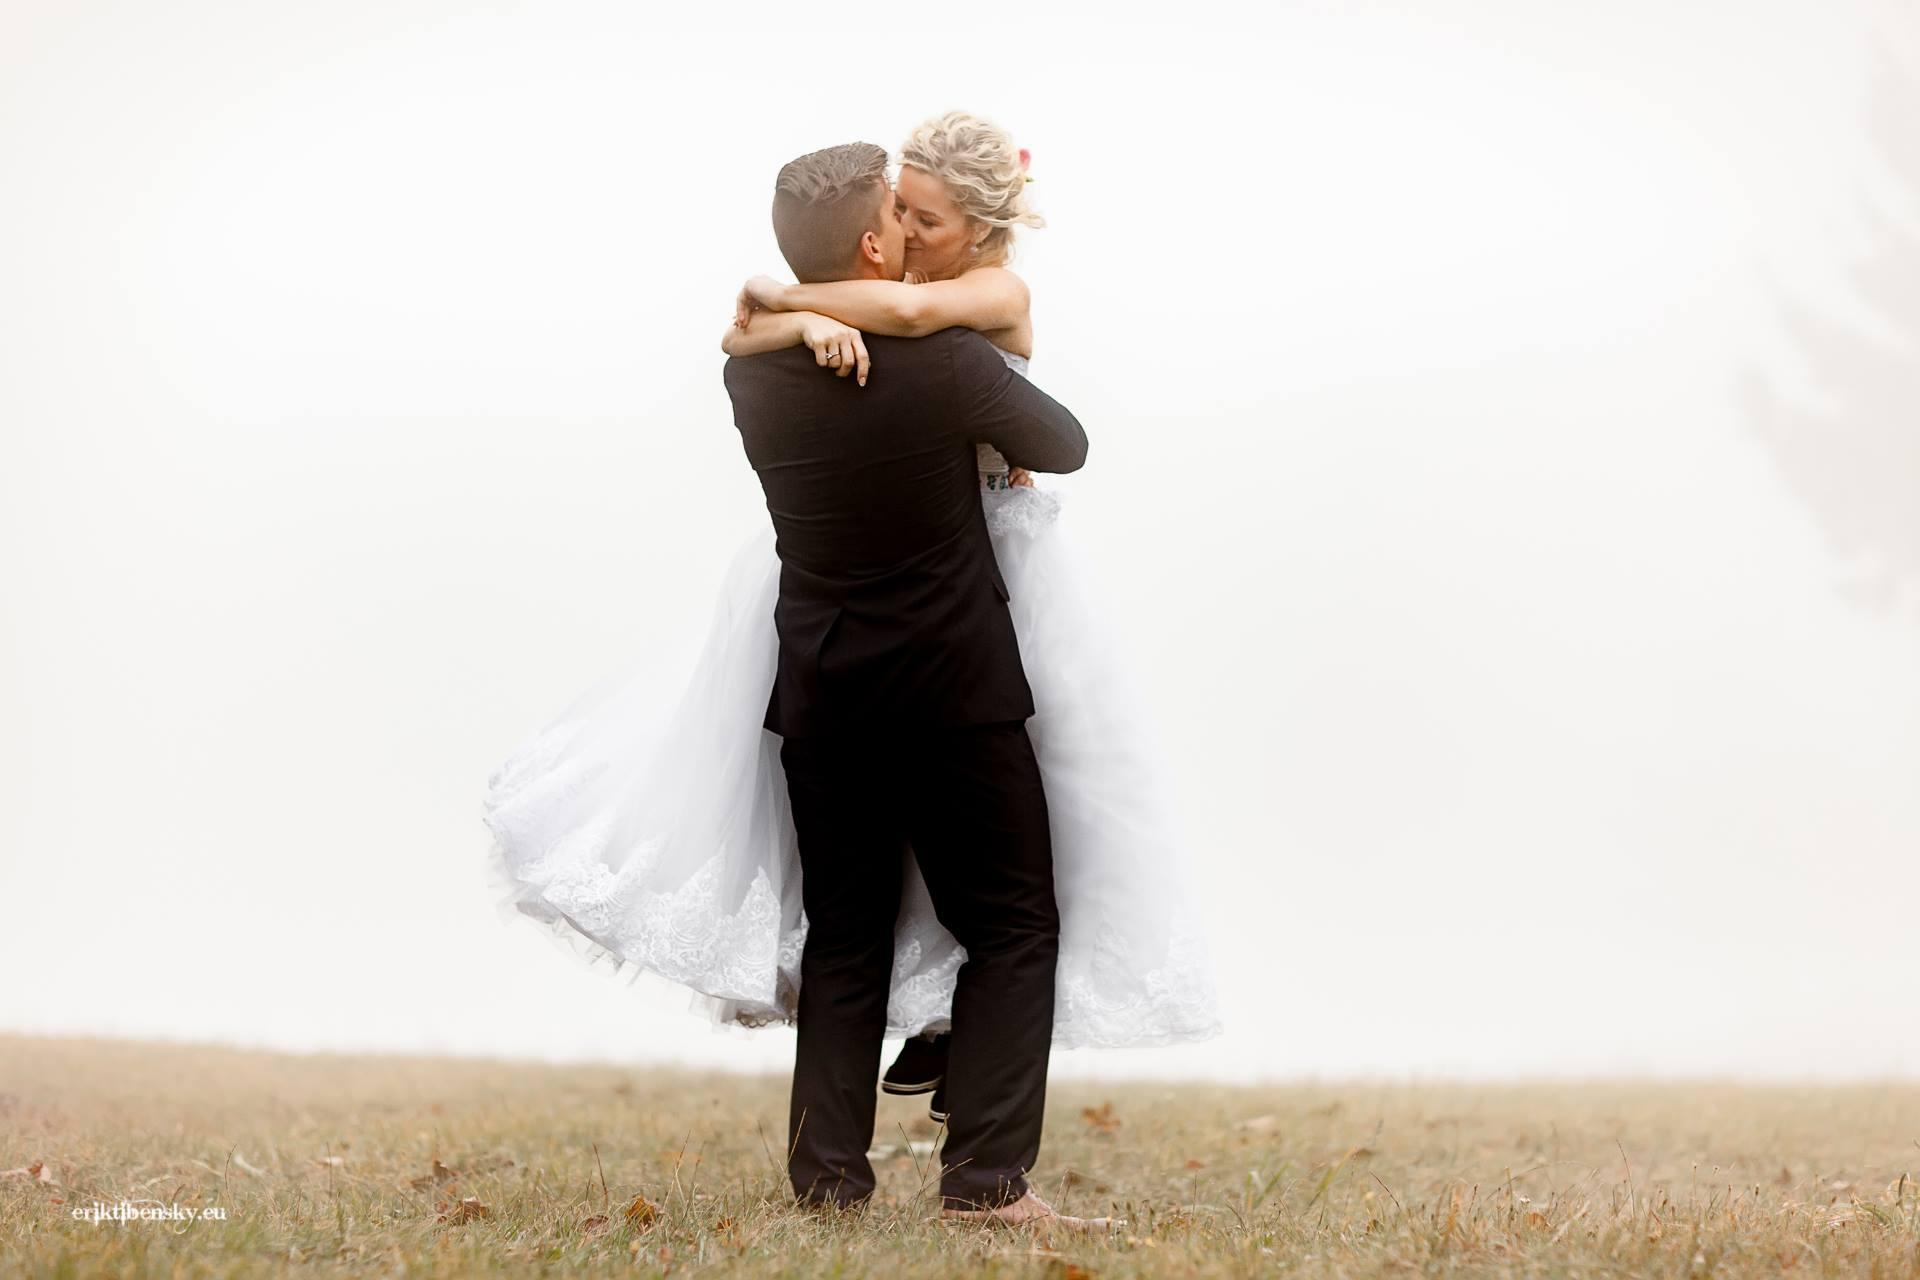 eriktibensky-eu-fotograf-wedding-photo-svadba-svadobny-pezinok-bratislava-modra-senec-1010